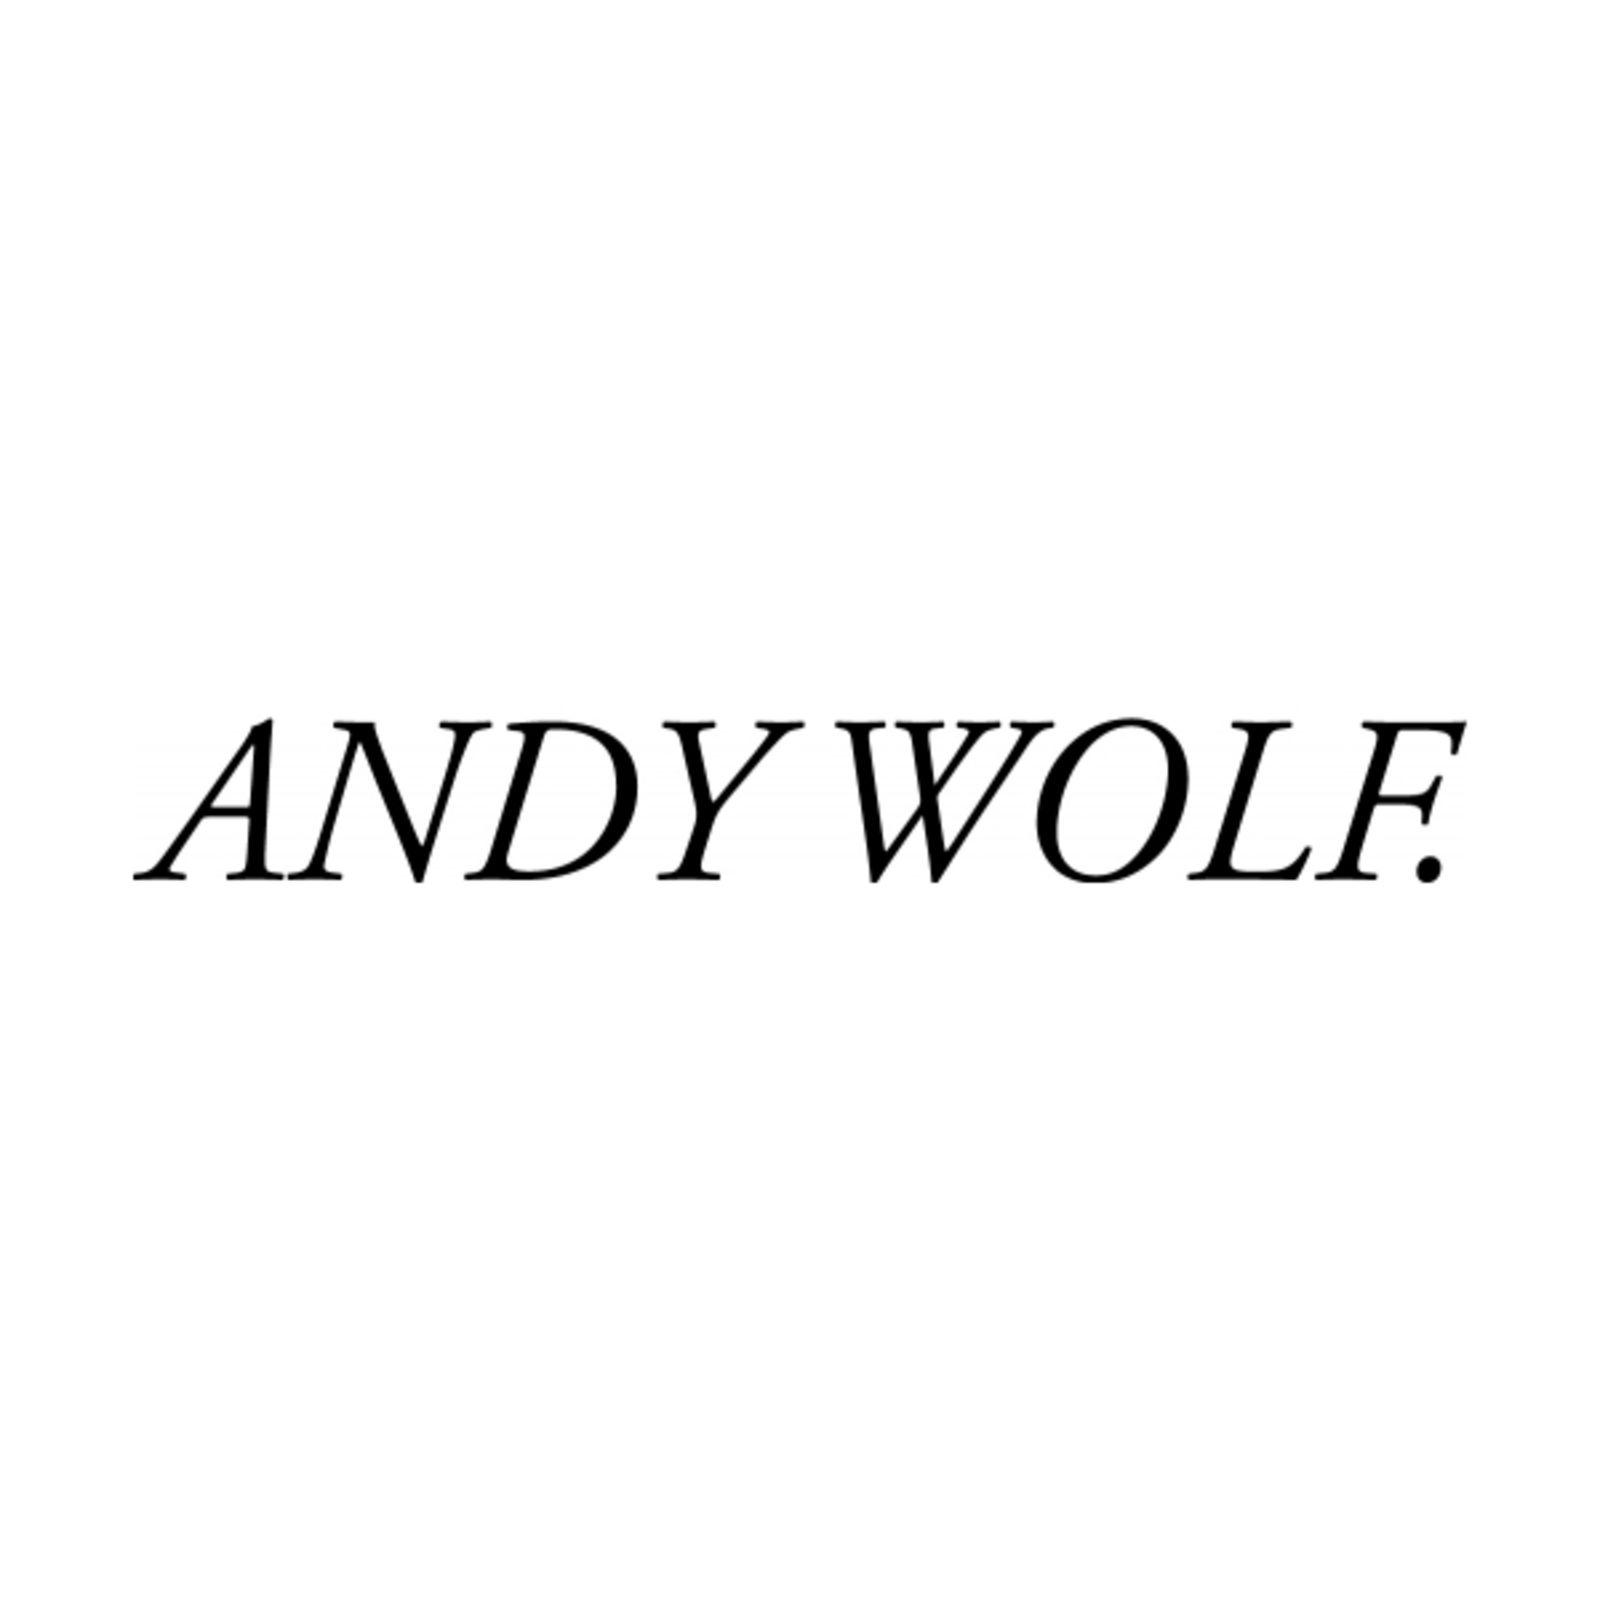 ANDY WOLF EYEWEAR (Image 1)